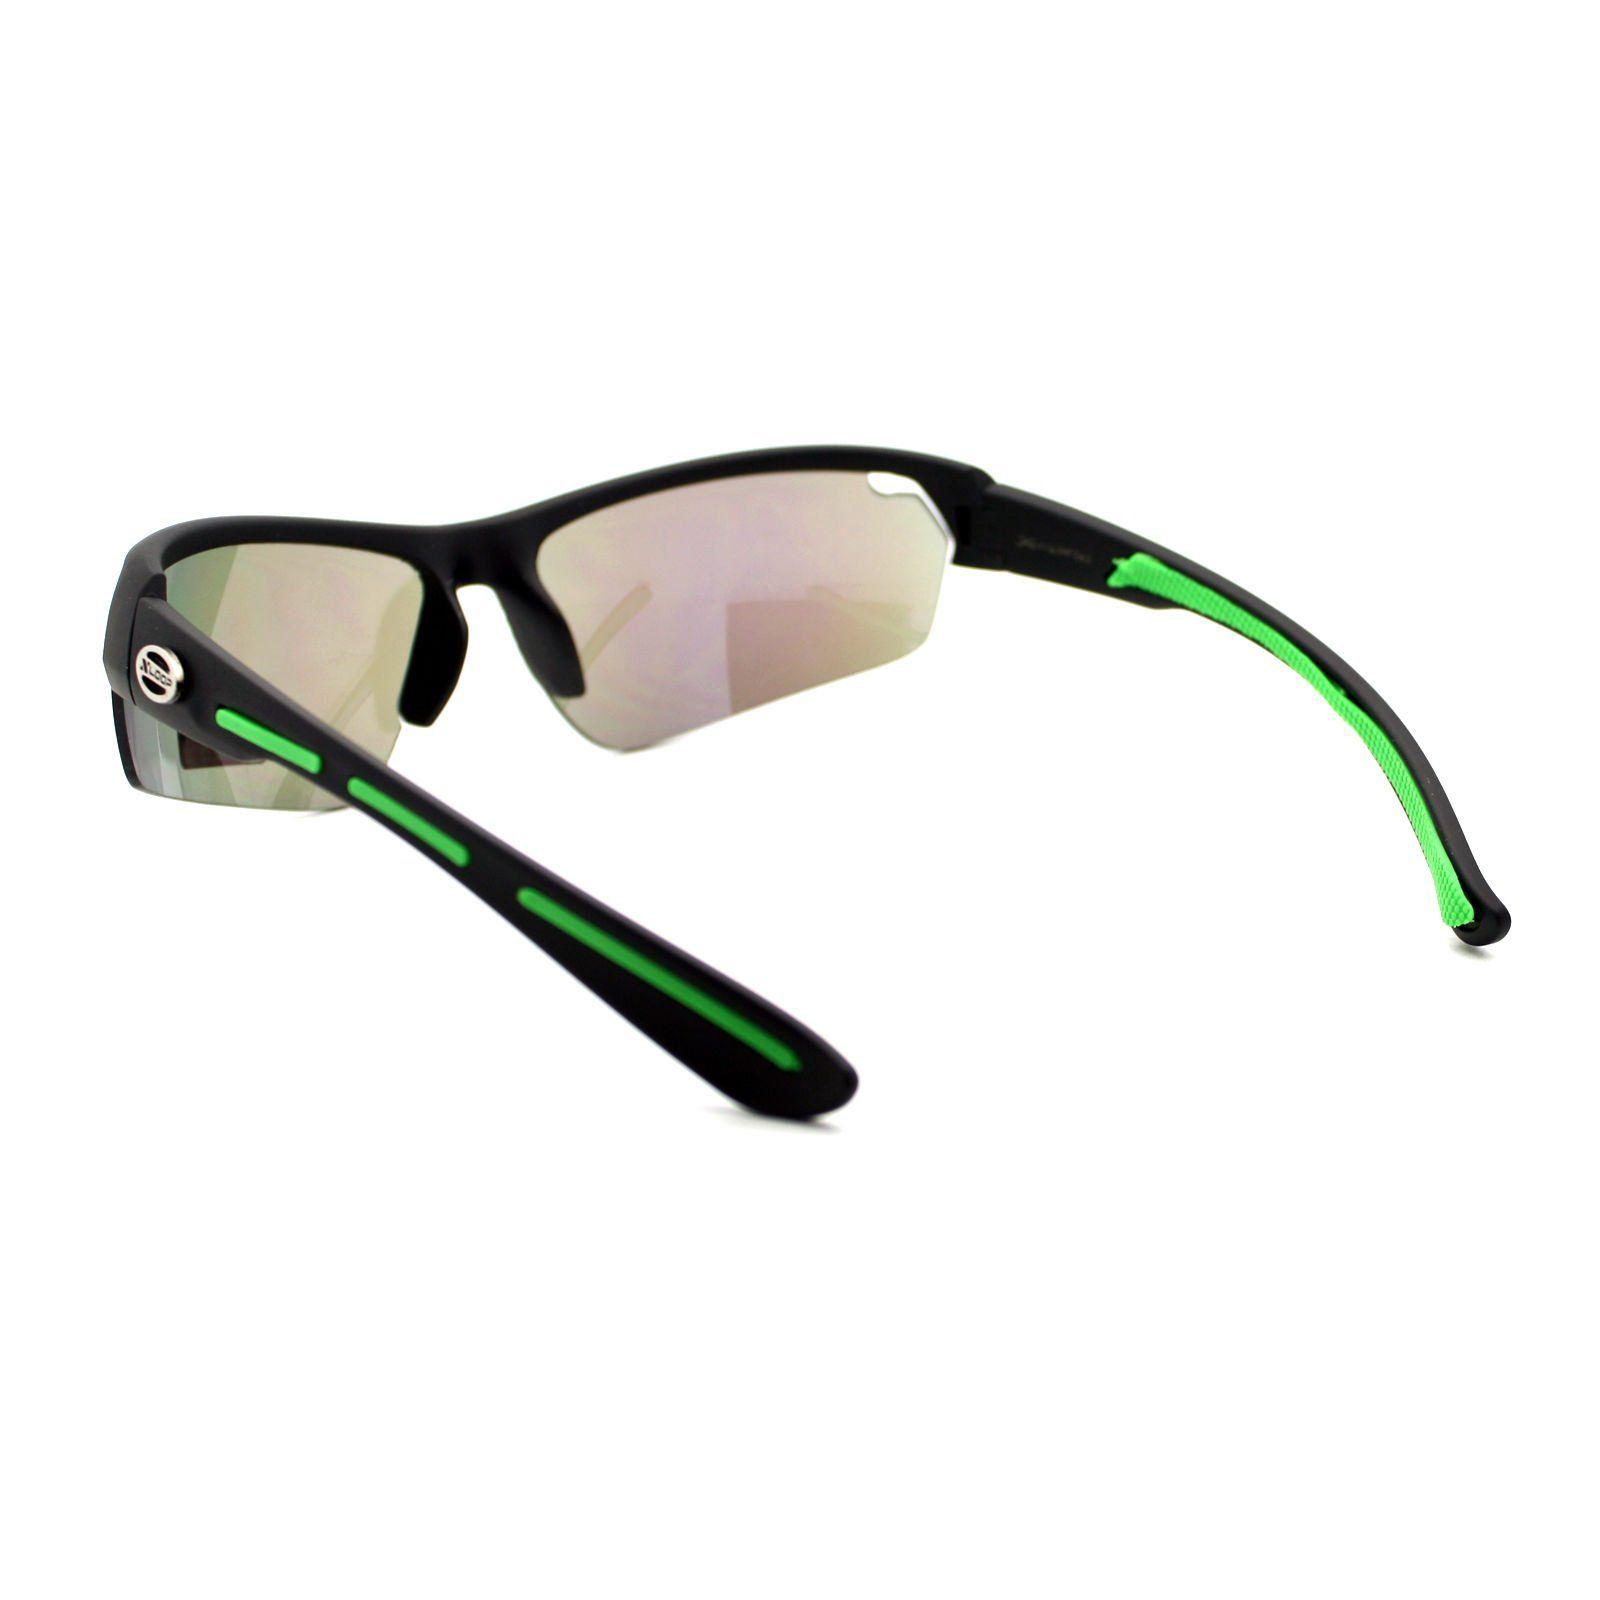 a11d496517 Xloop Polarized Lens Sunglasses Mens Half Rim Sports Wrap Around Shades  Men s Accessories Sunglasses   Sunglasses Accessories